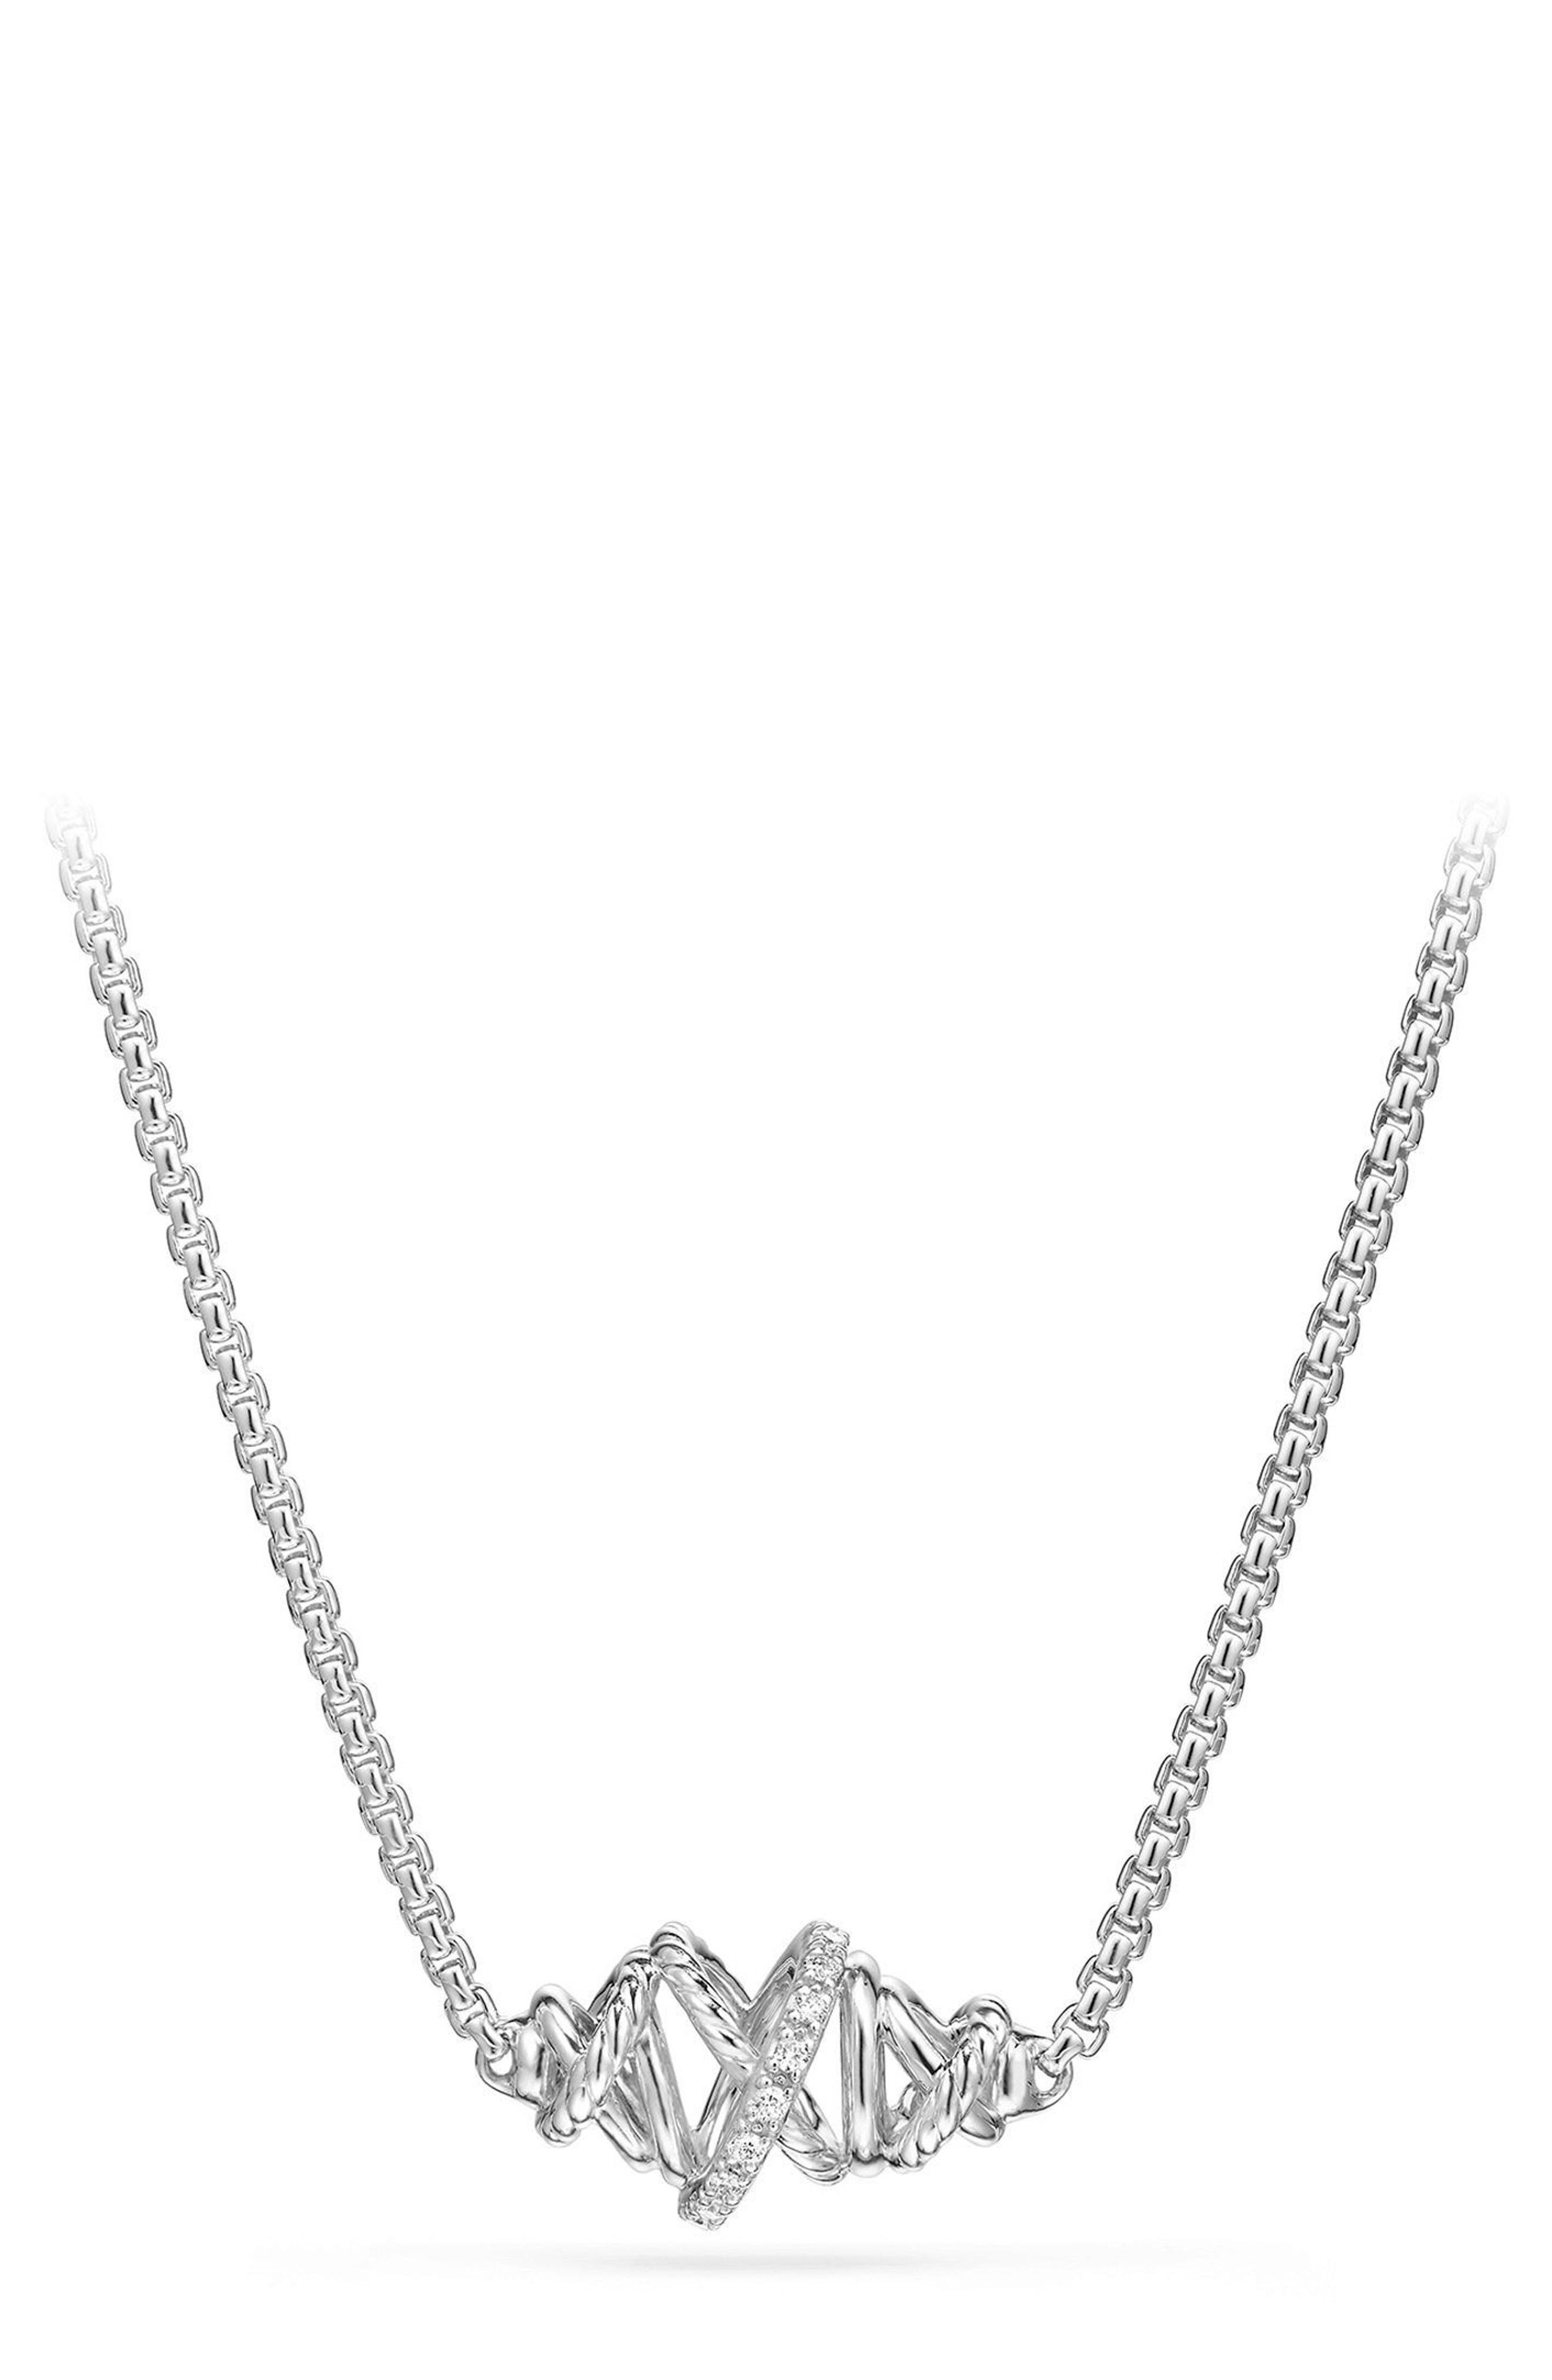 Alternate Image 1 Selected - David Yurman Crossover Single Station Necklace with Diamonds